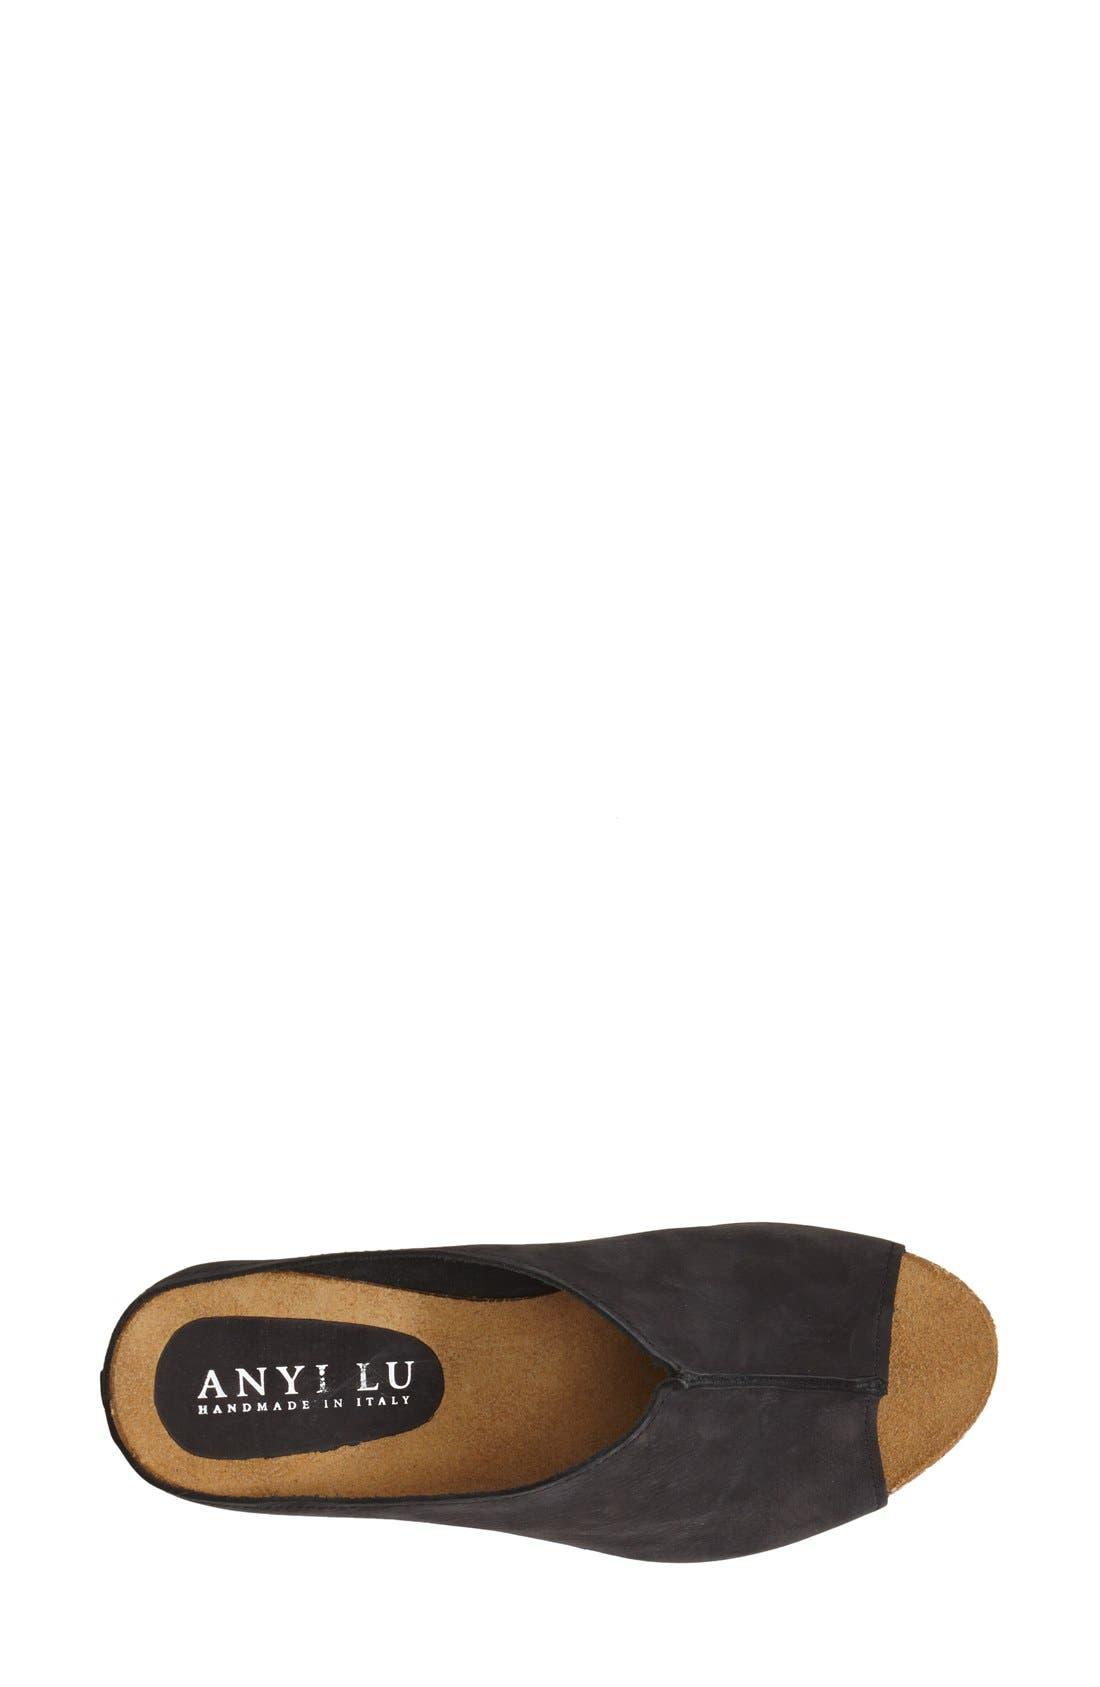 Alternate Image 3  - Anyi Lu 'Sara' Nubuck Leather Peep Toe Mule Wedge (Women)